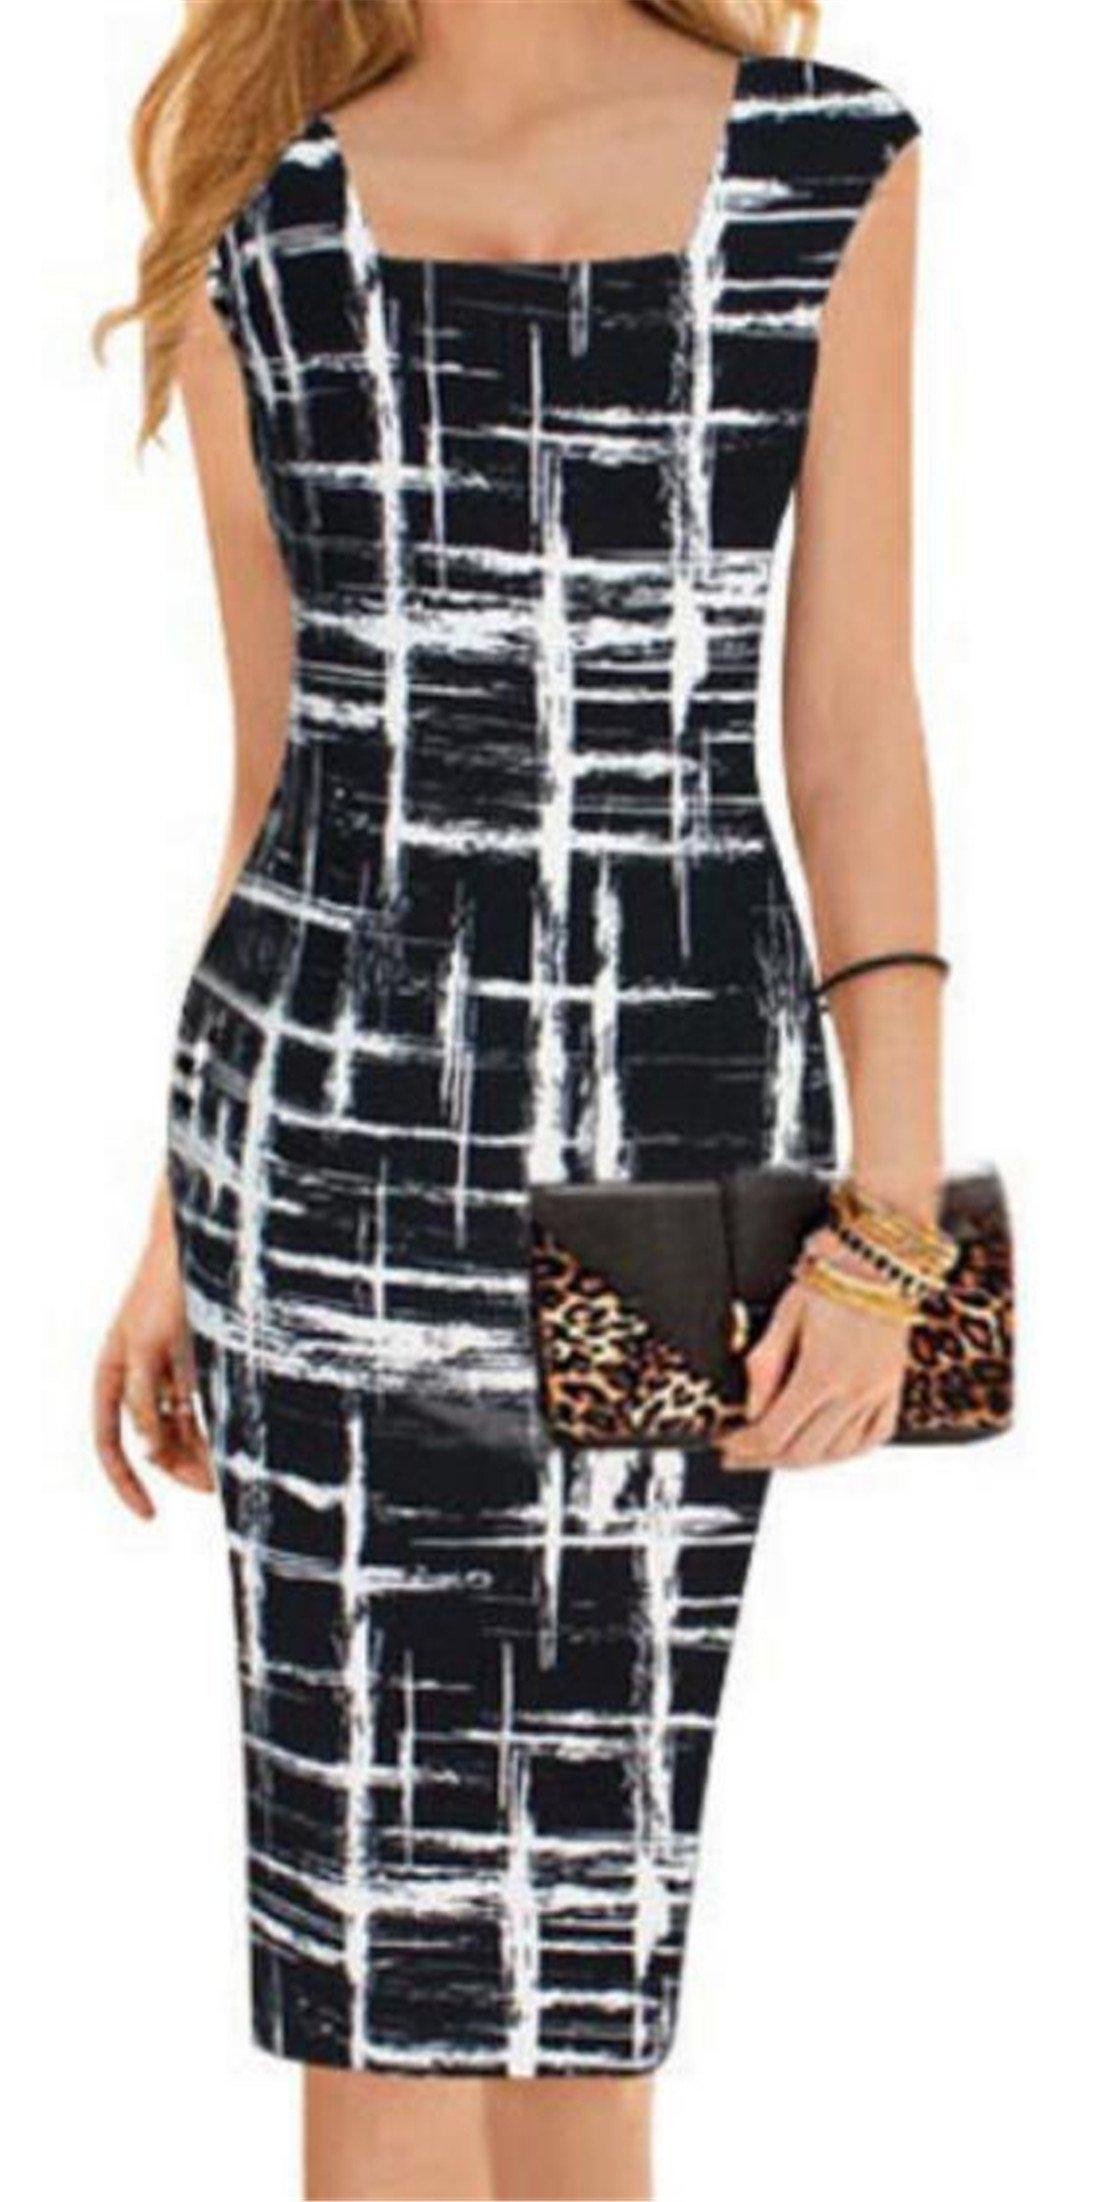 KLJR-Women Elegant Square Neck Striped Wear to Work Cocktail Bodycon Pencil Dress Aspic US L